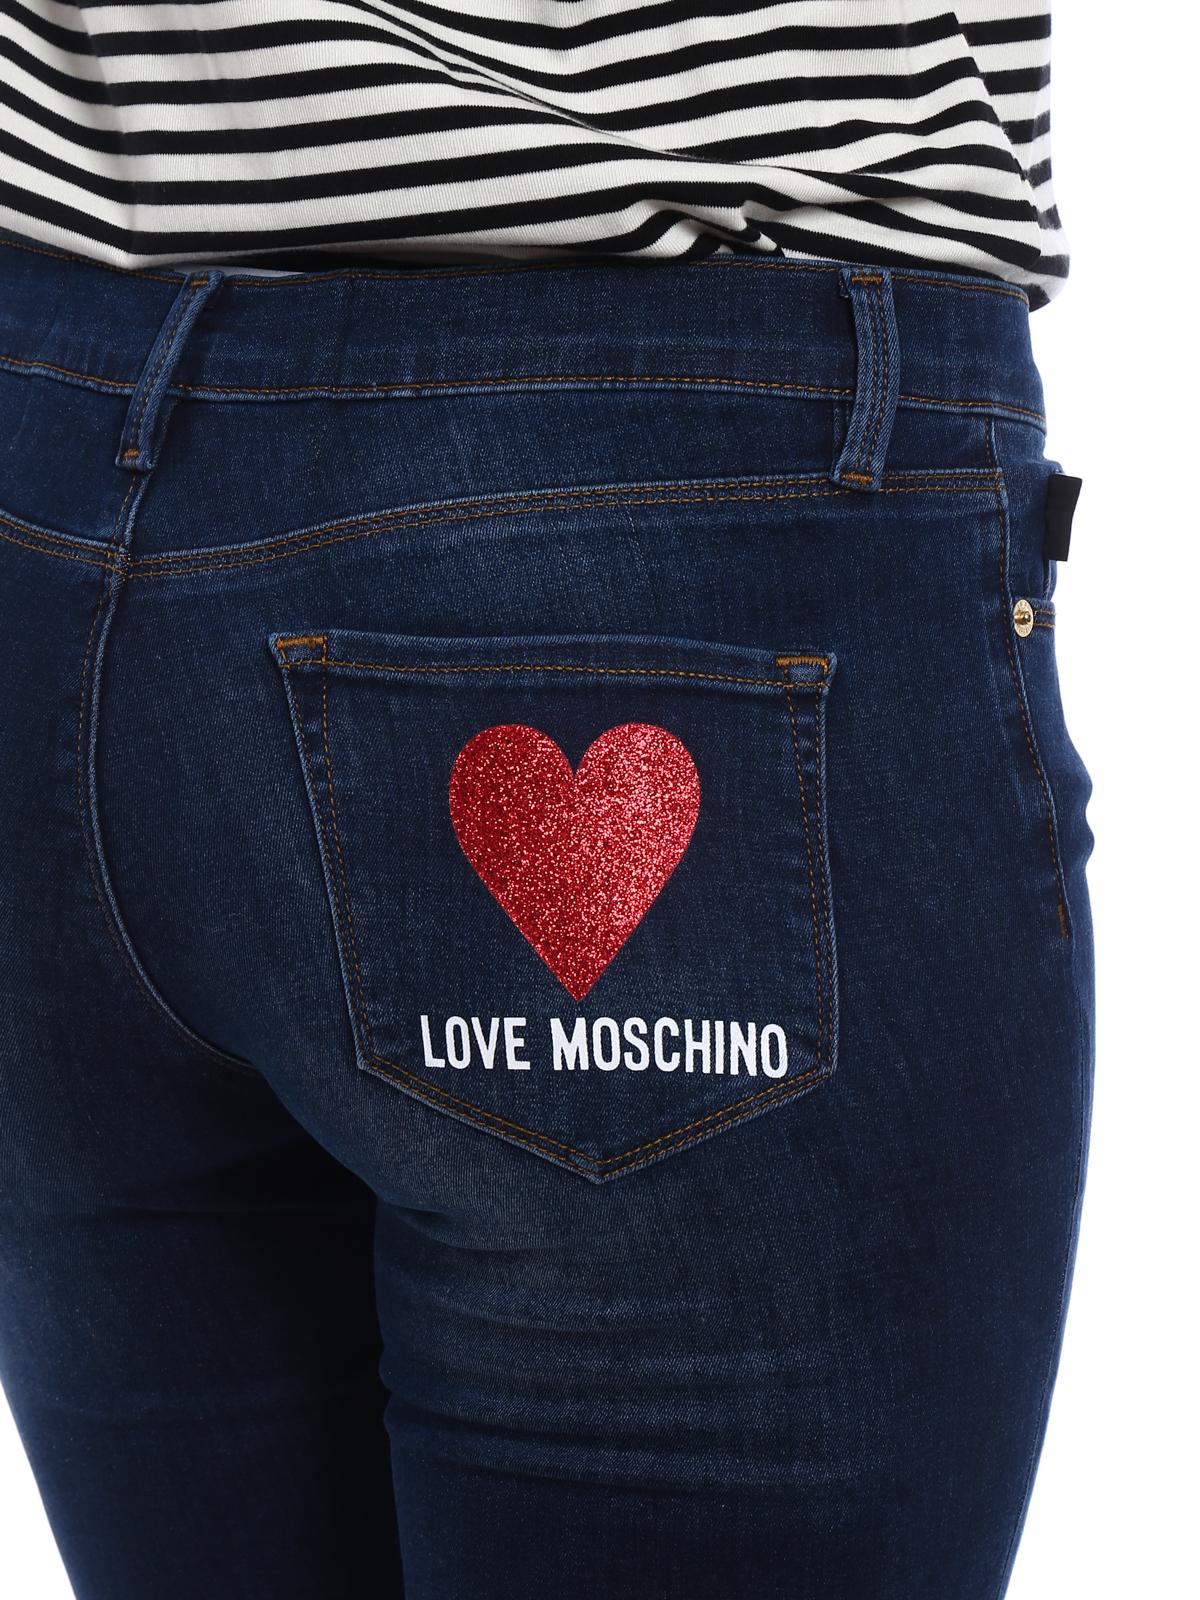 4cbd1bf096 Love Moschino - Stretch denim flared crop jeans - flared jeans ...